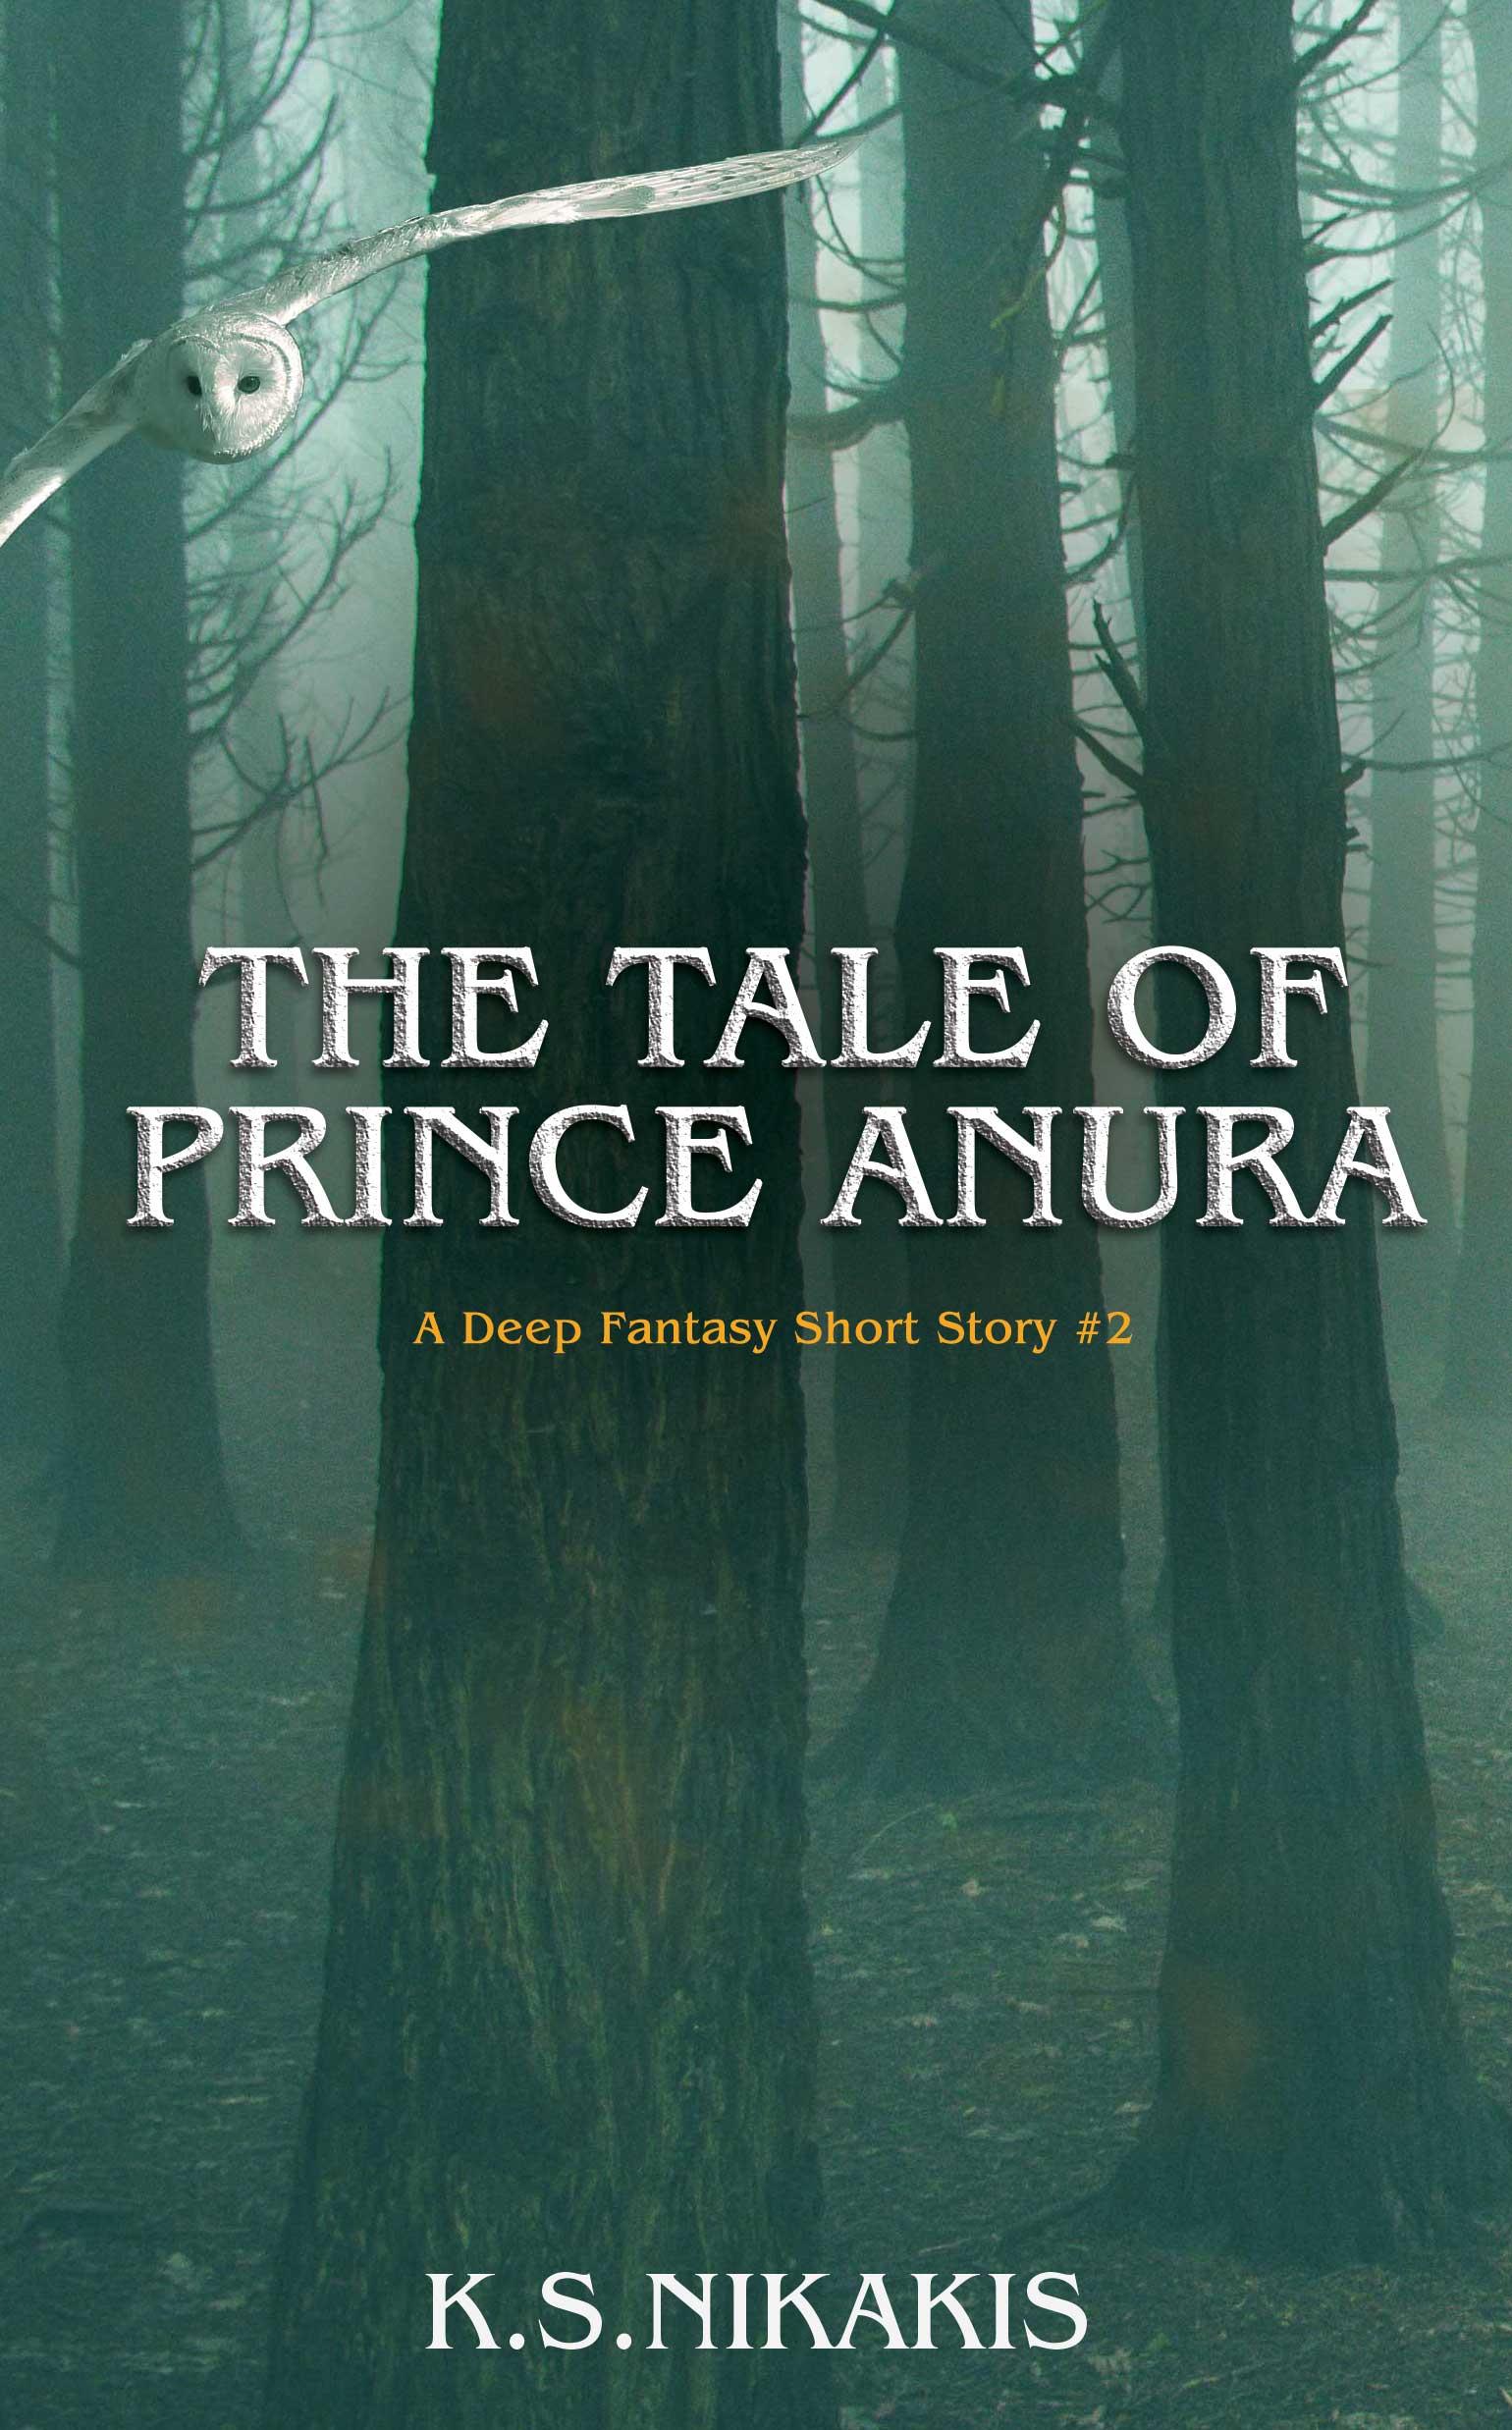 short-story-theTailOfPrinceAnura-02.jpg